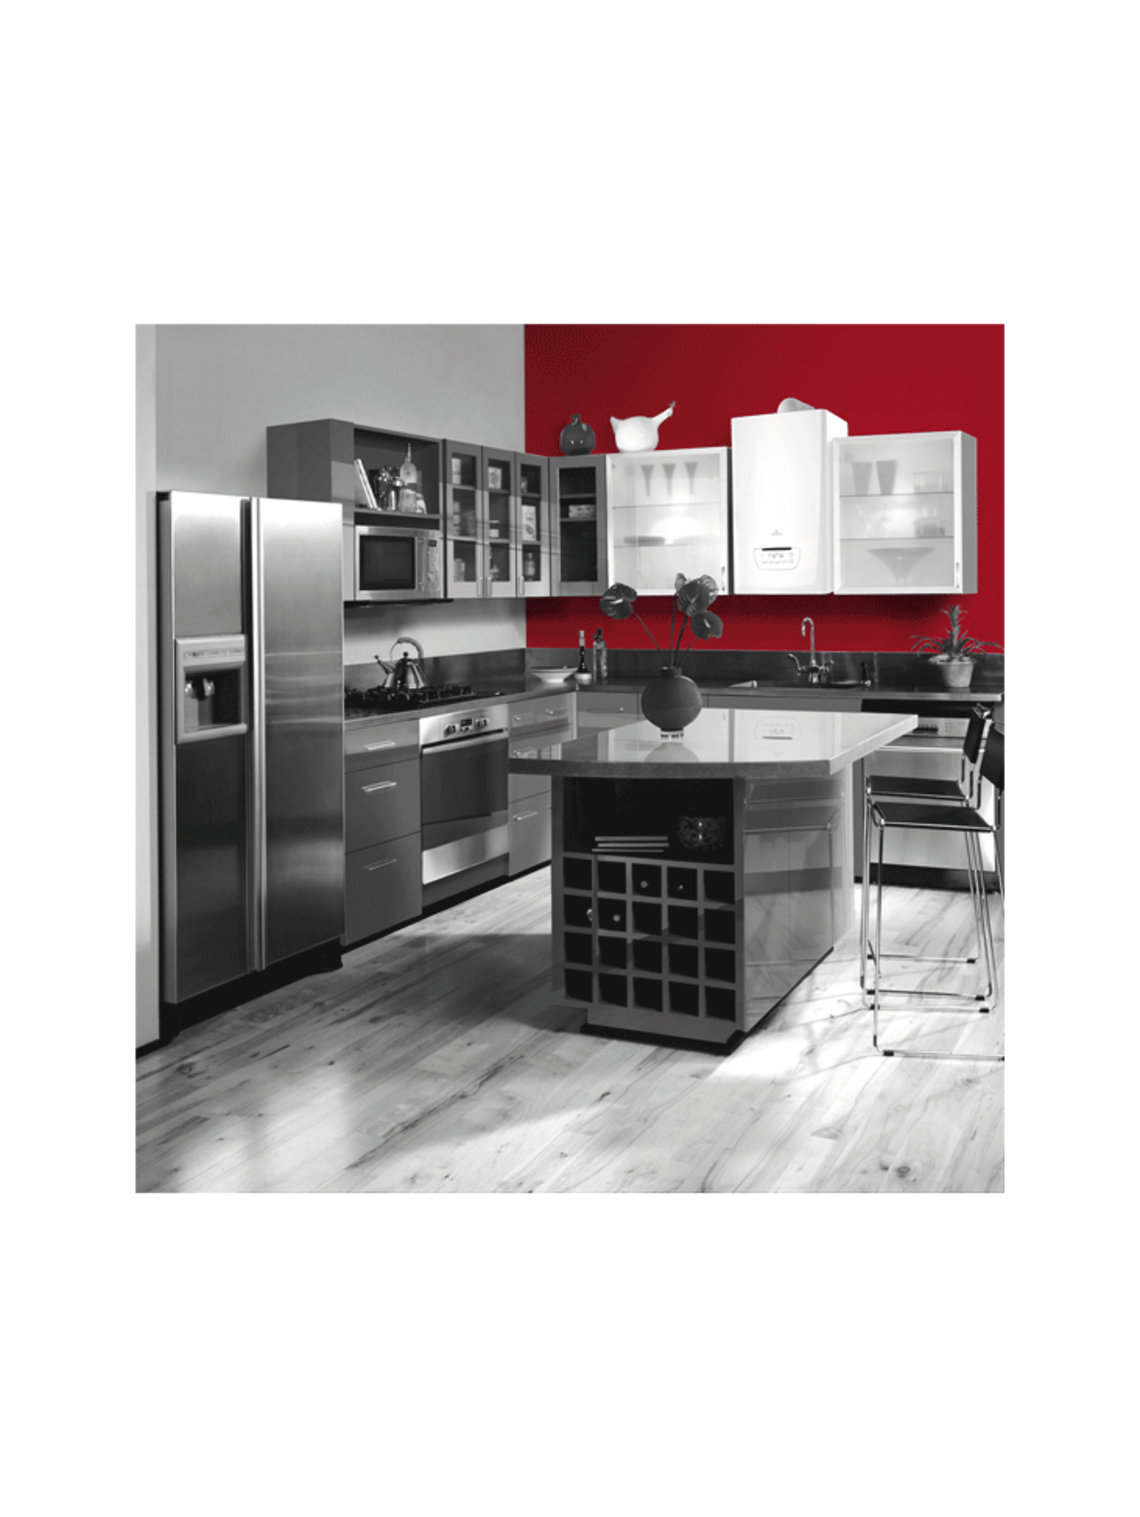 themaplus condens chaudieres gaz condensation pros saunier duval des chaudieres gaz. Black Bedroom Furniture Sets. Home Design Ideas